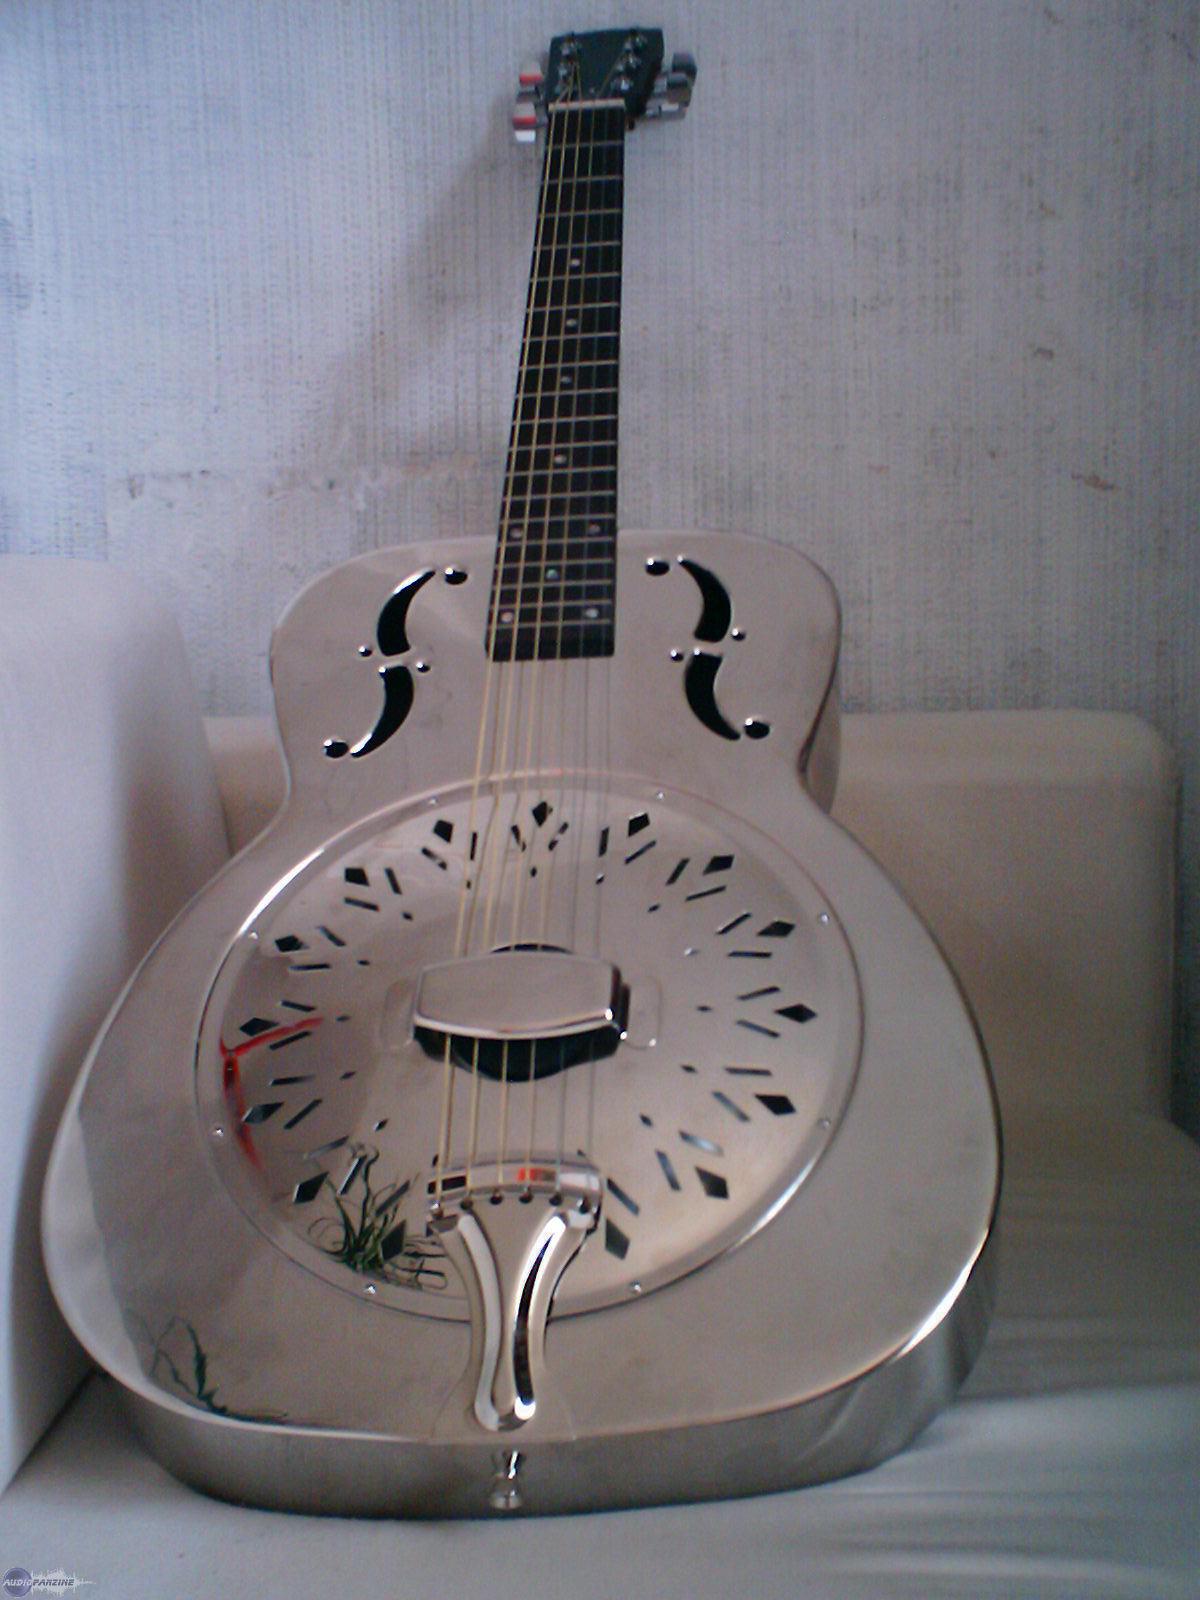 johnson guitars dobro image 653288 audiofanzine. Black Bedroom Furniture Sets. Home Design Ideas